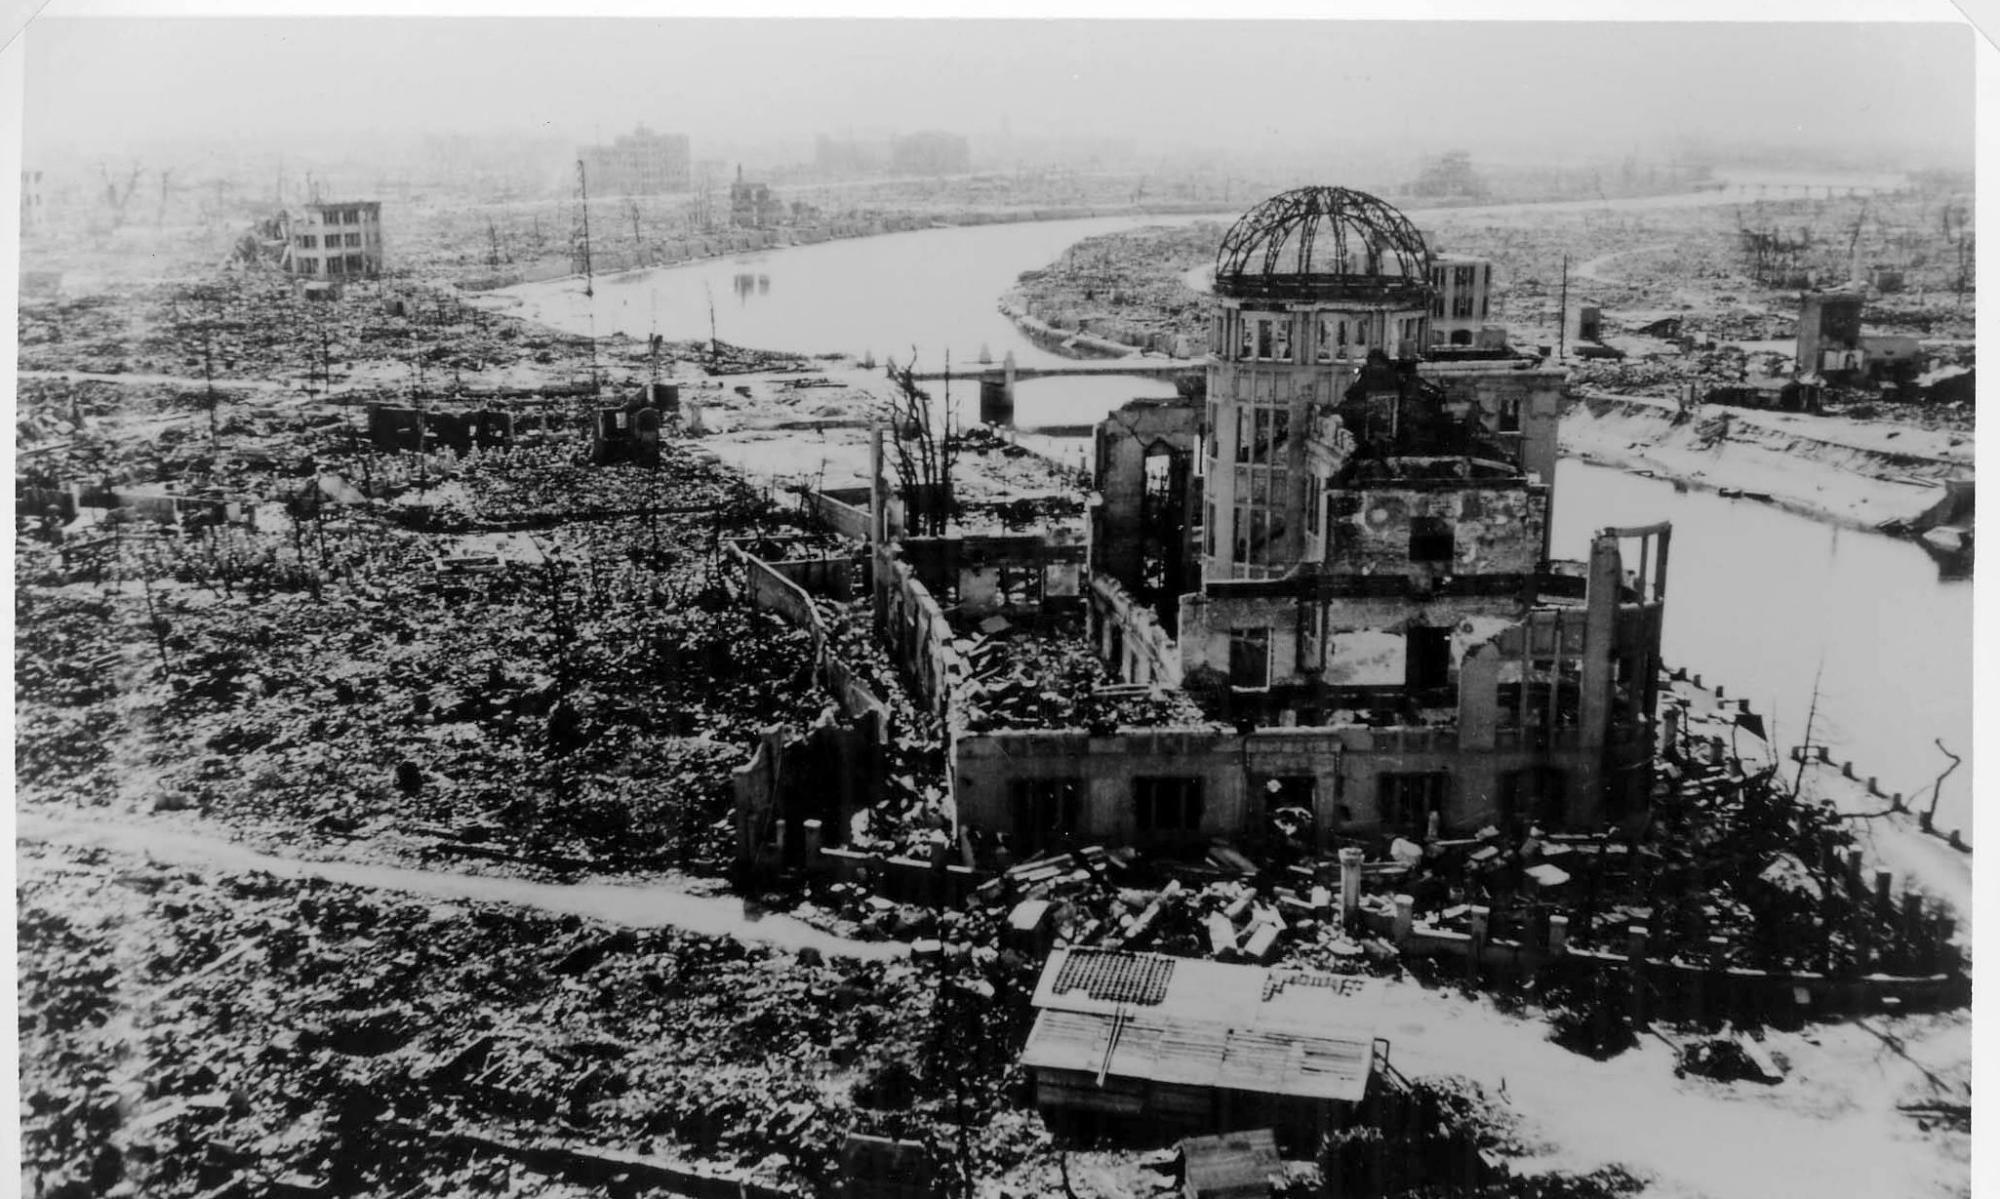 #Sejarah Hari Ini: Langit Kelabu di Hiroshima